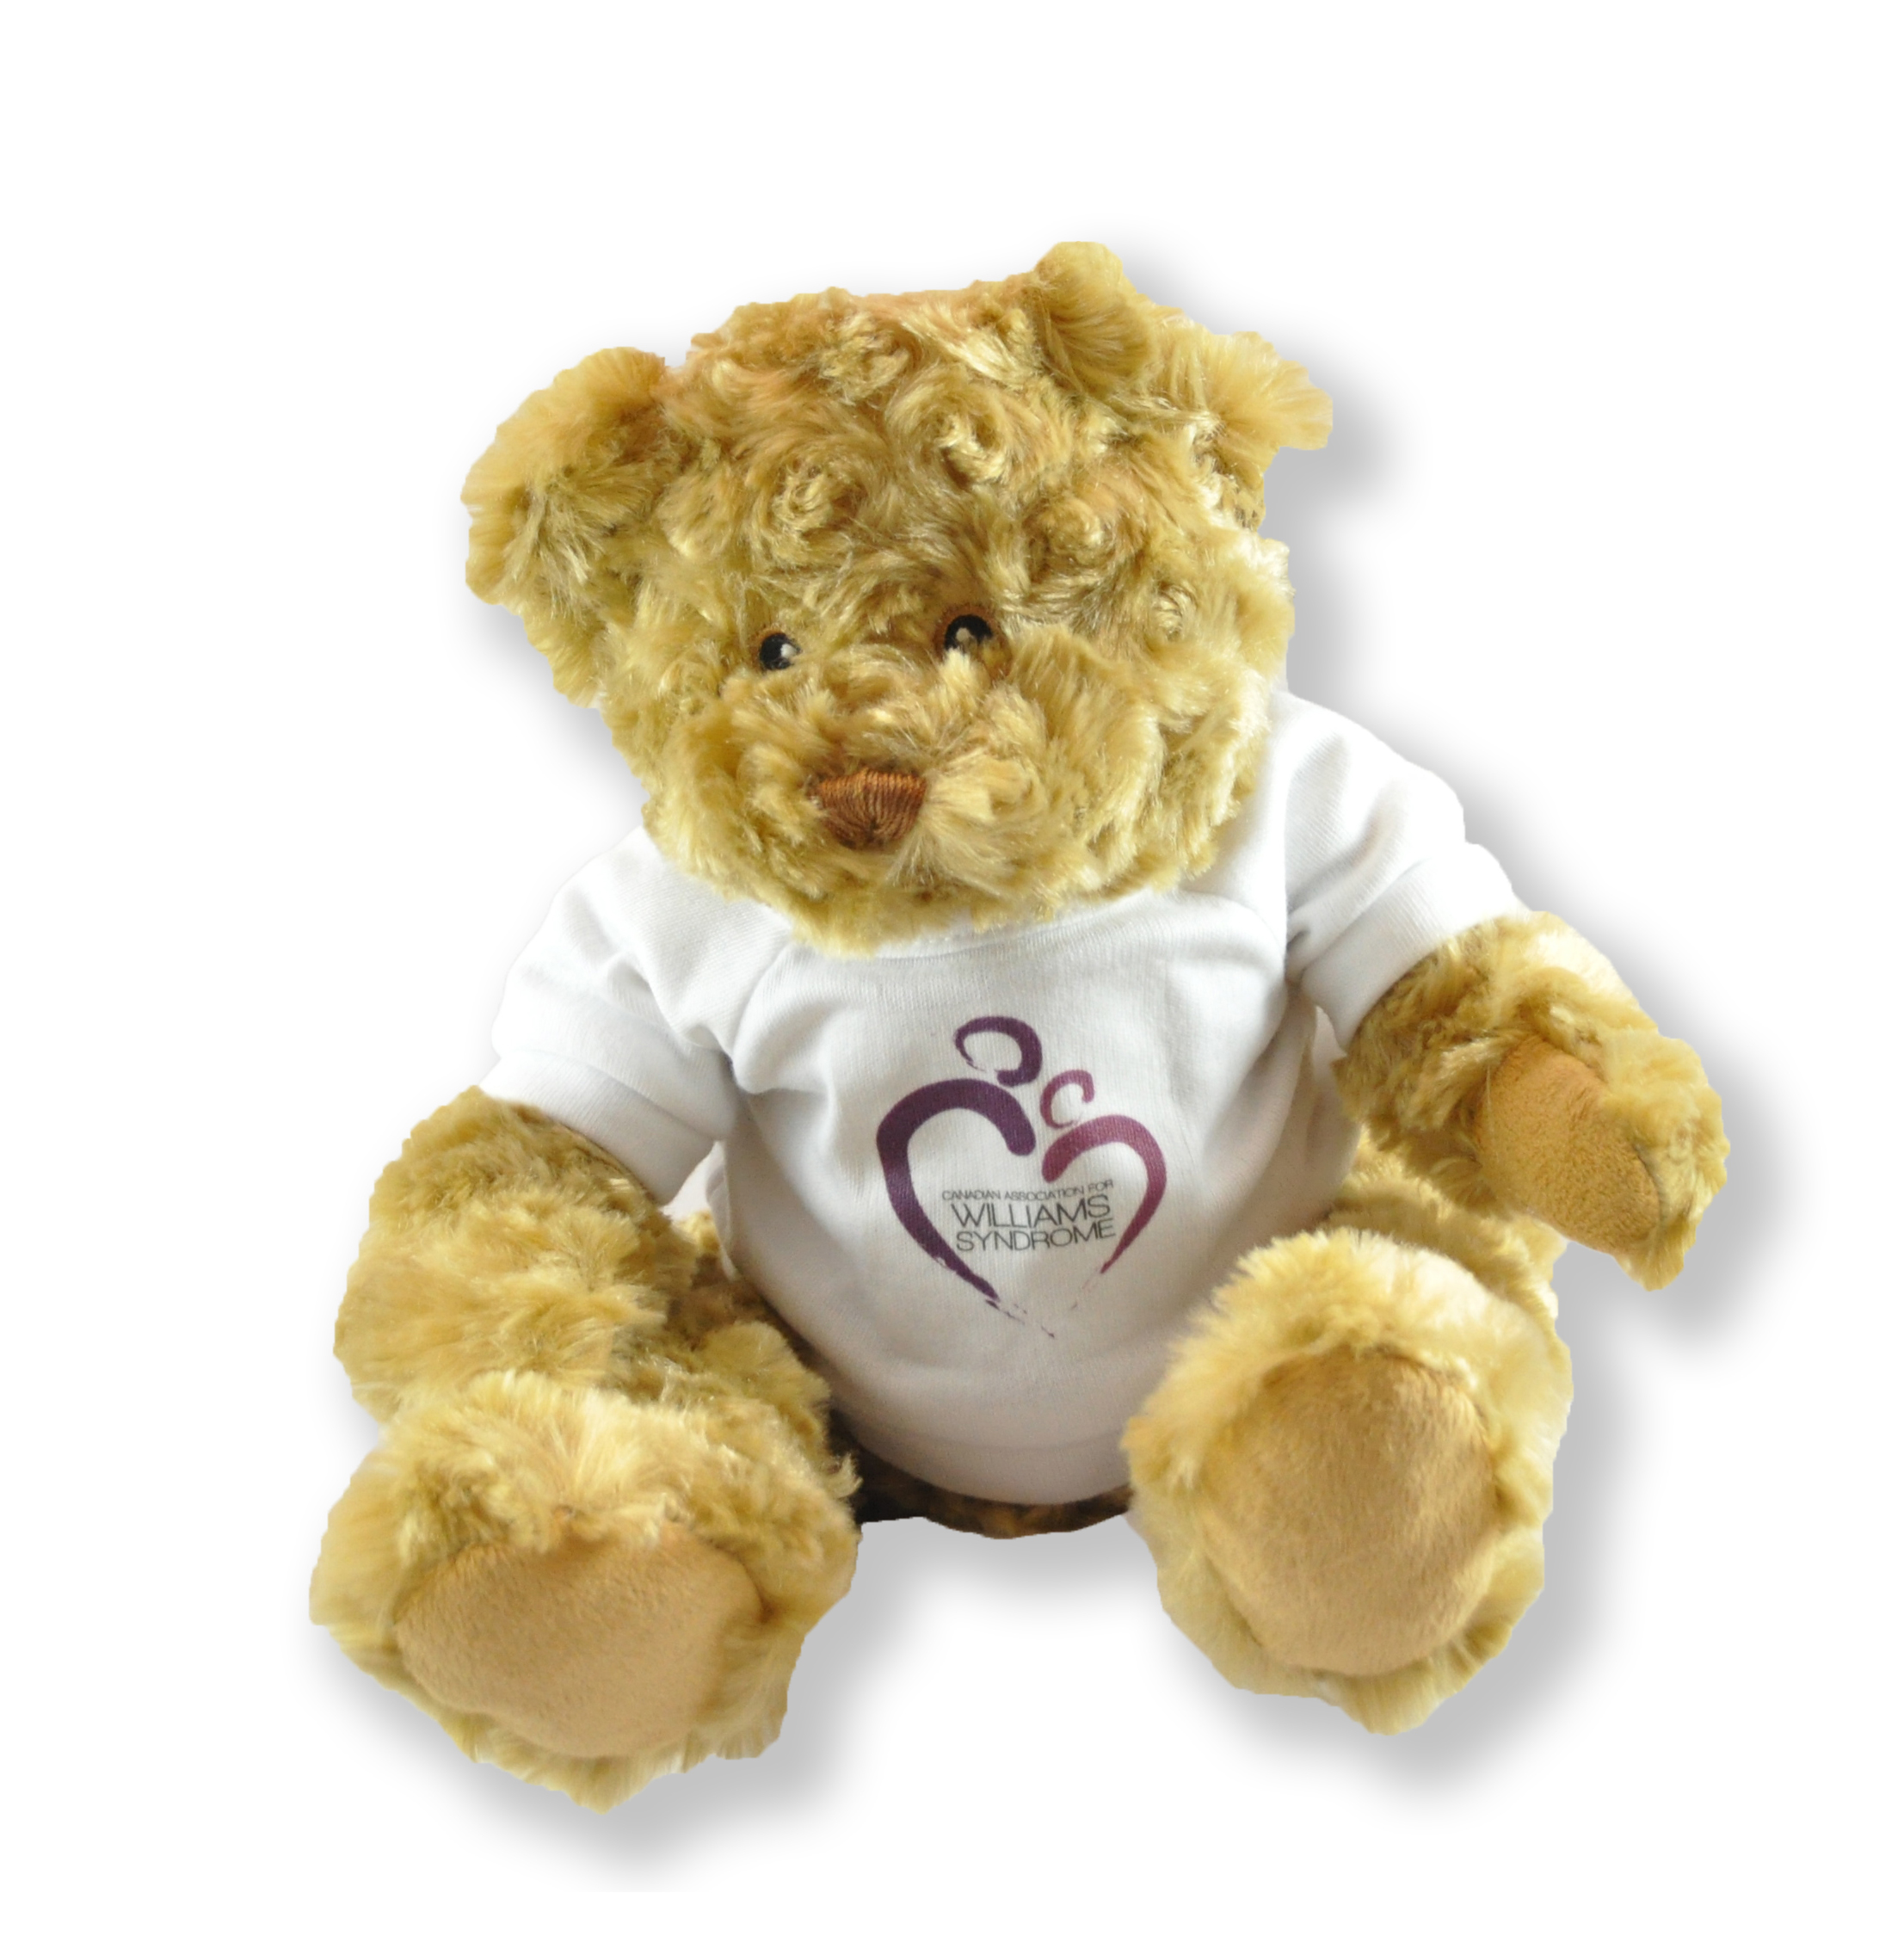 williamssyndrome.ca// CAWS teddy bear